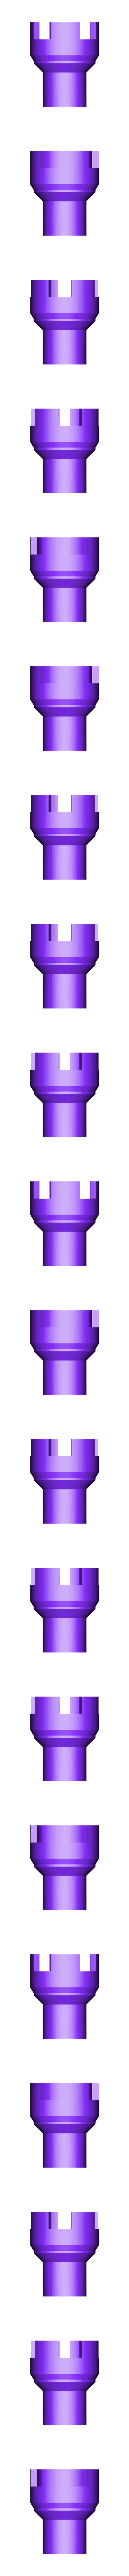 Thumper_body_6.stl Download free STL file Dune Thumper - working • 3D printing design, poblocki1982